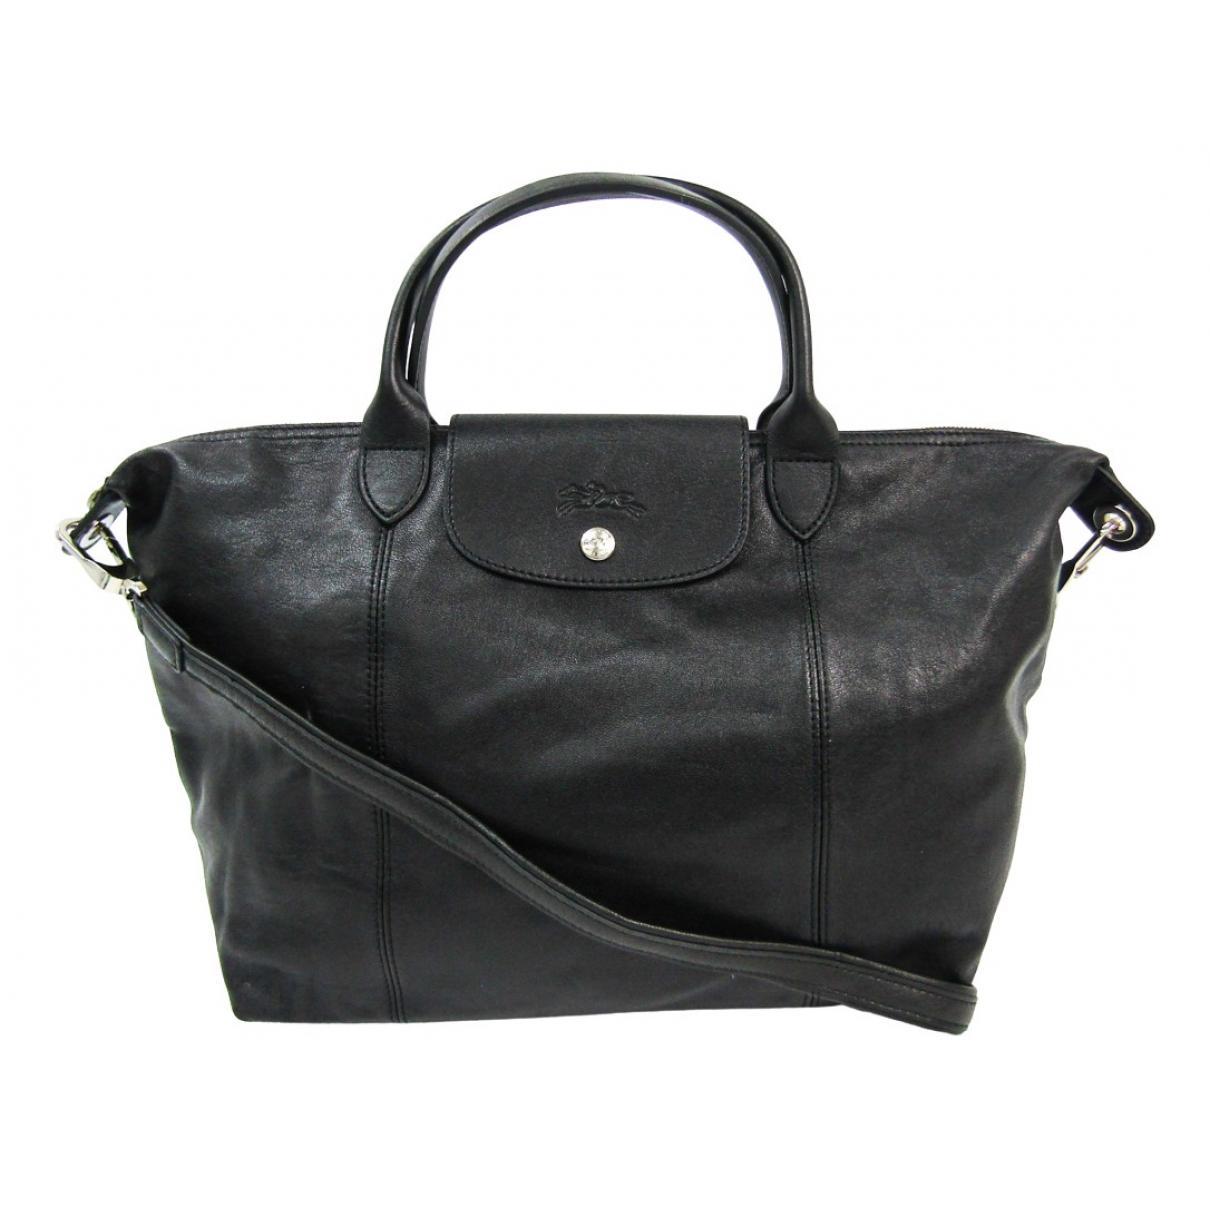 Longchamp Pliage  Black Leather handbag for Women \N